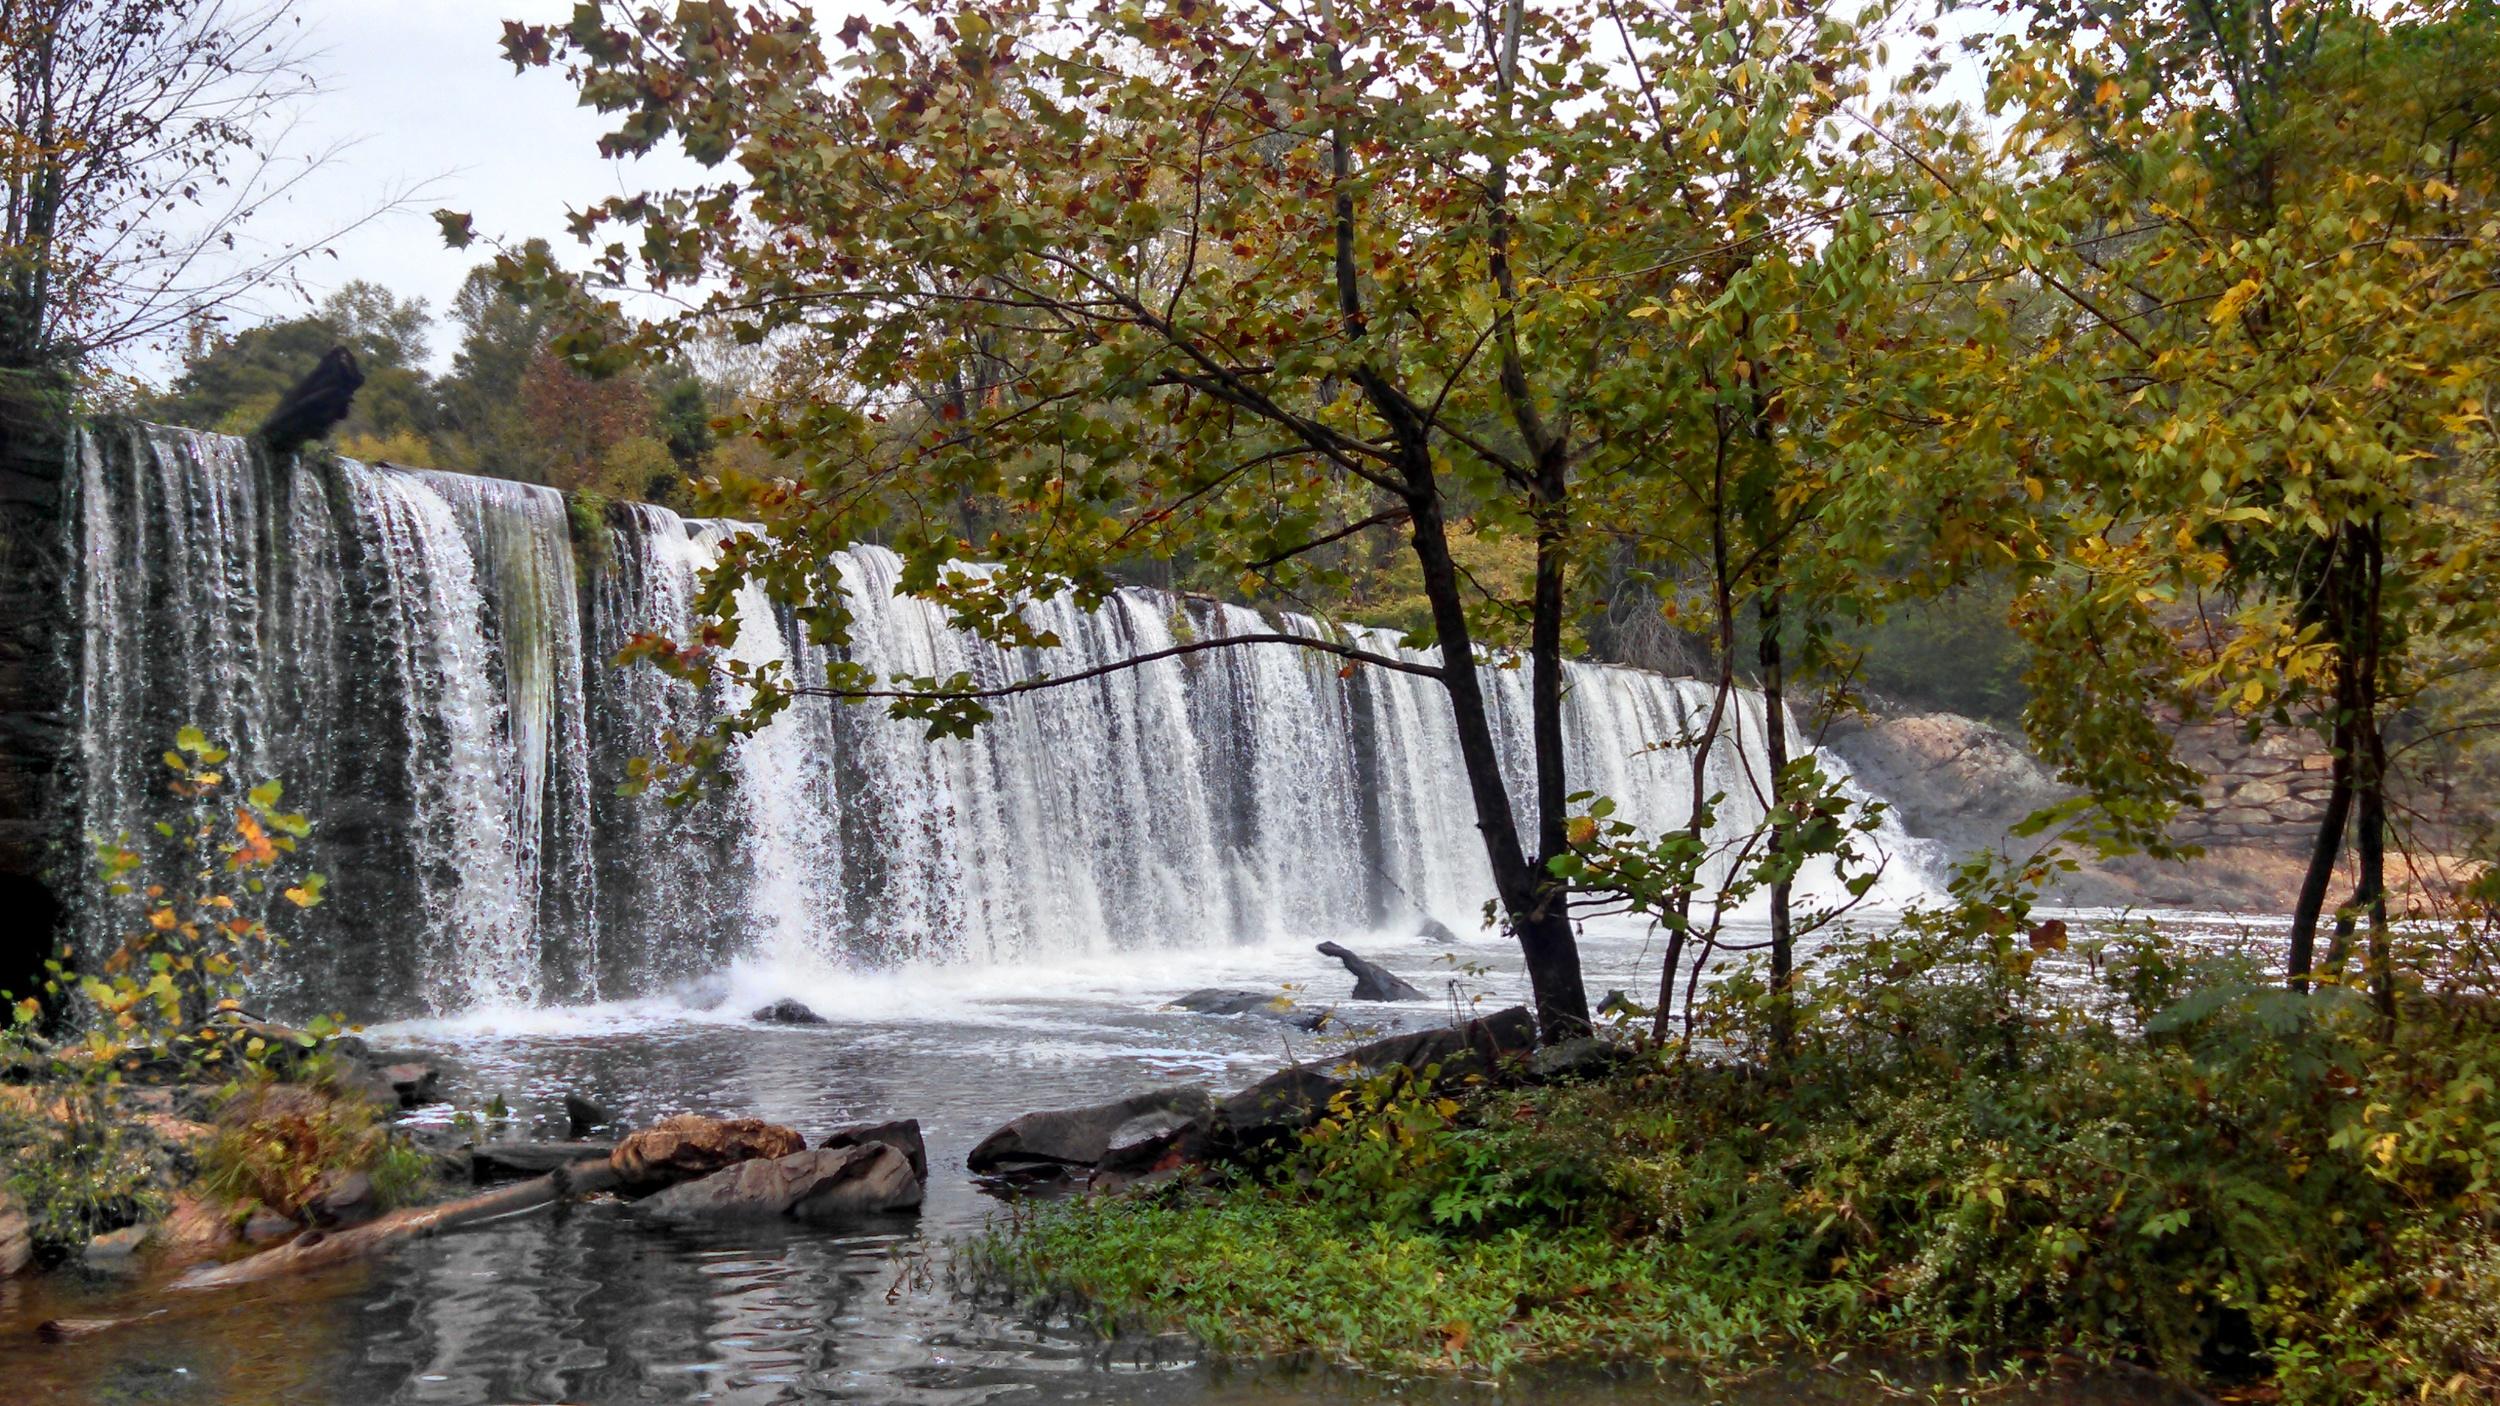 Randleman's Deep River Greenway